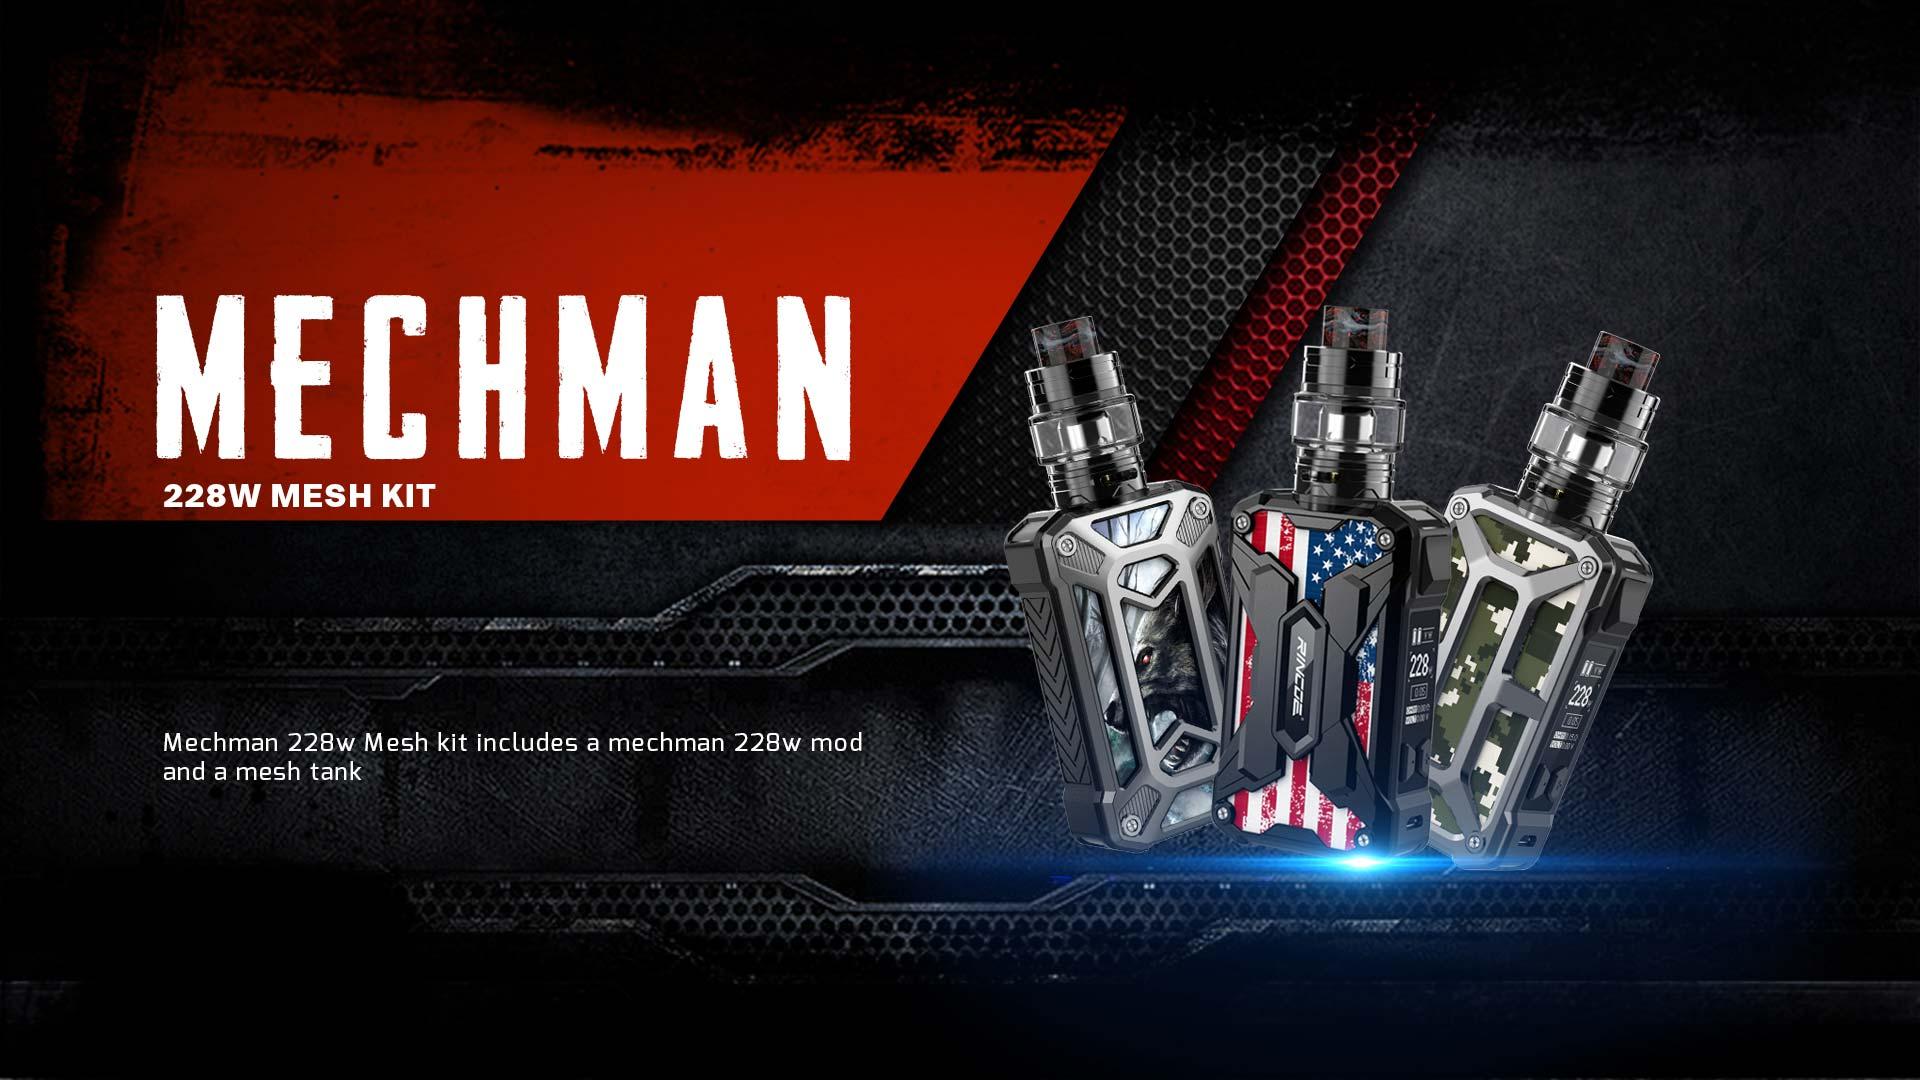 Mechman 228W Mesh kit